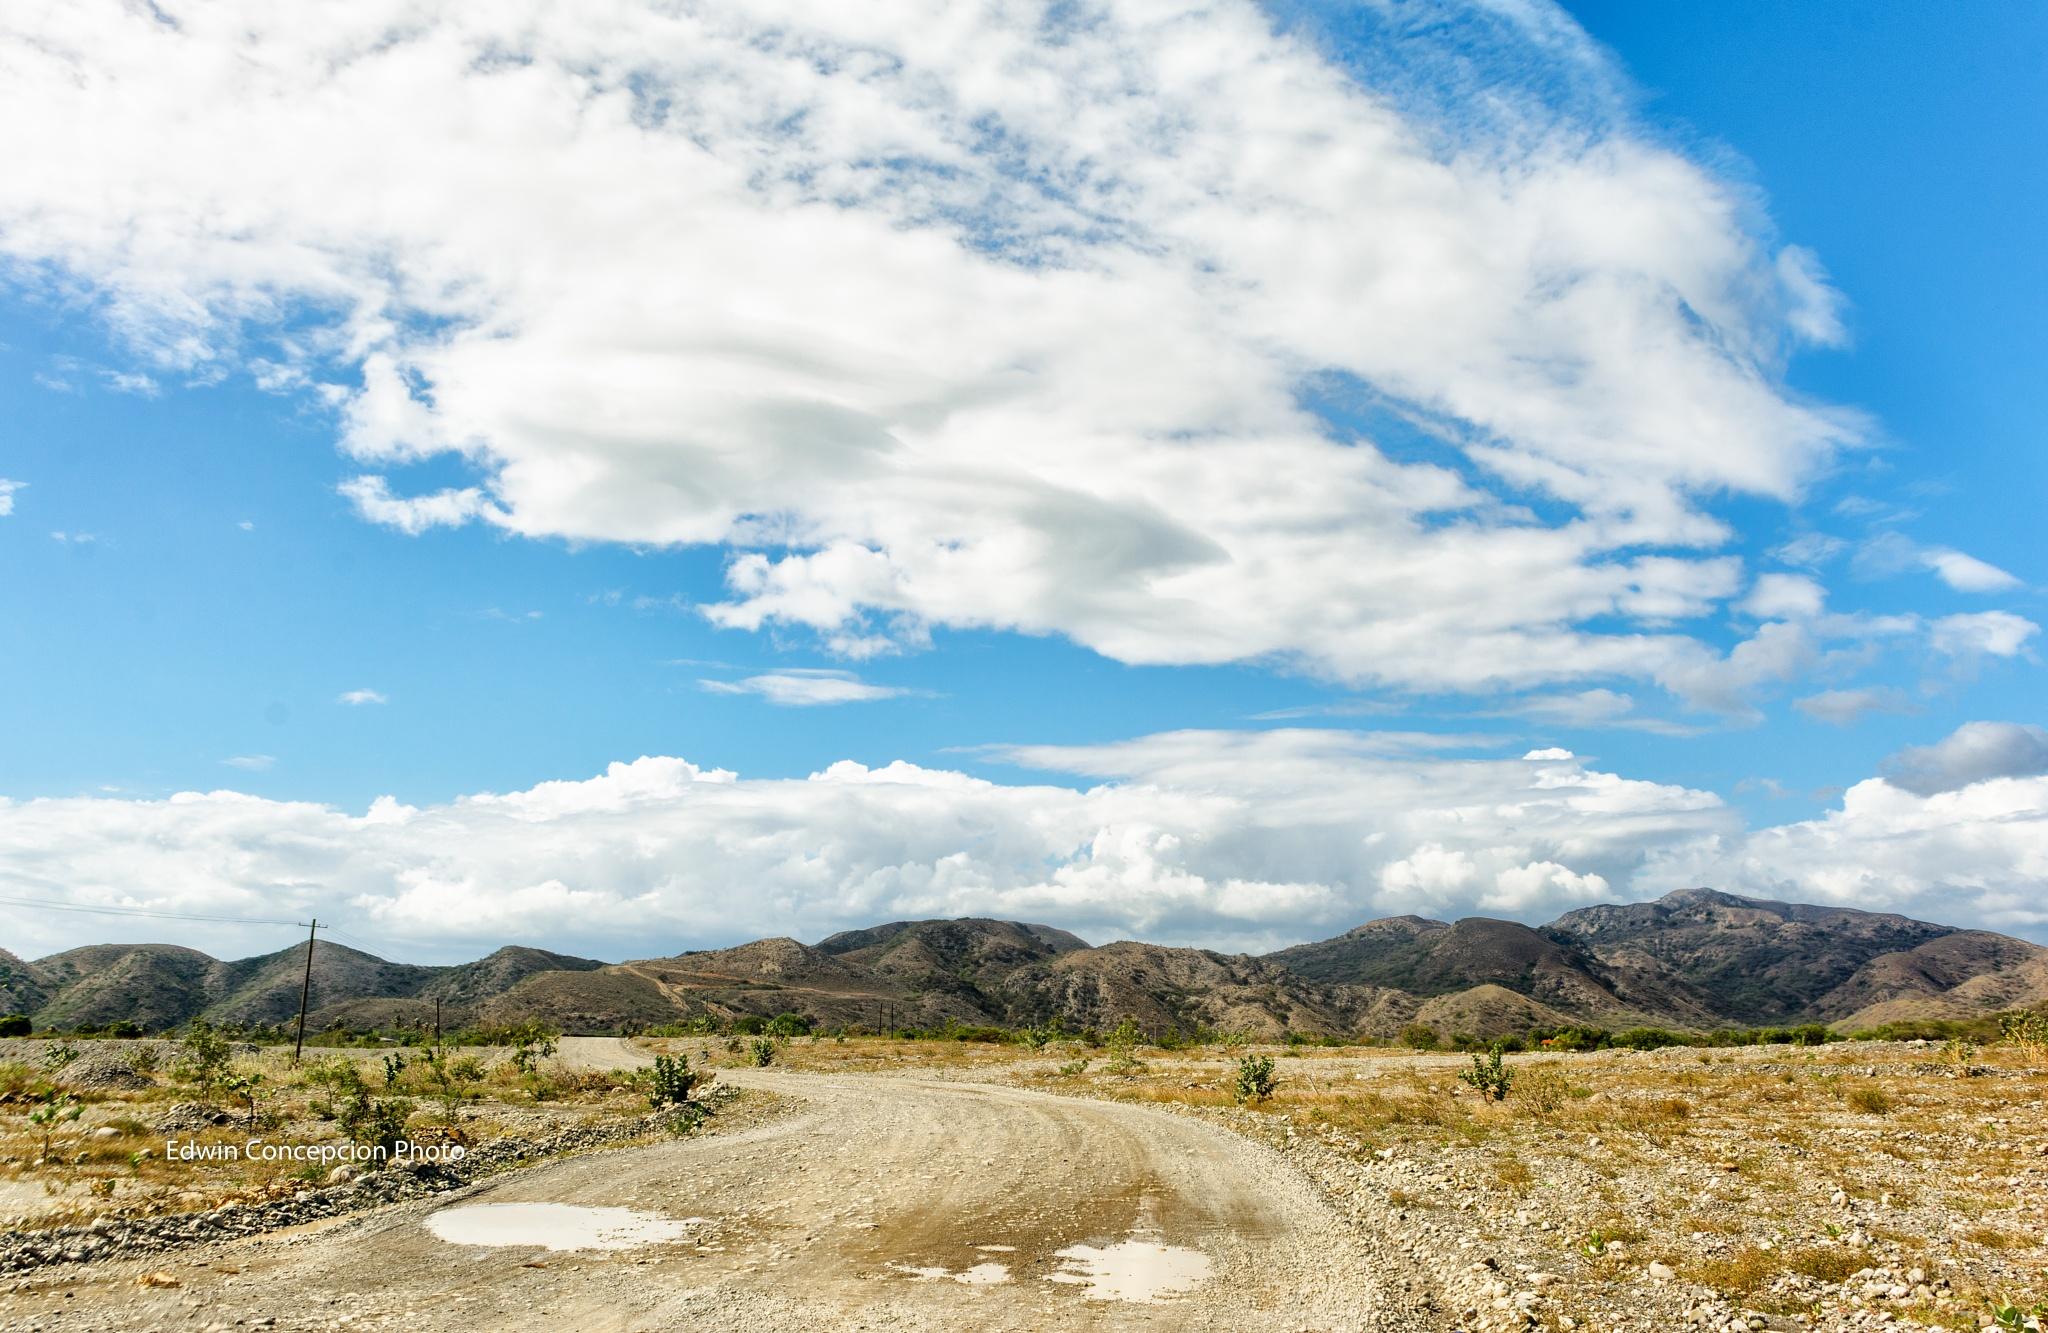 Road to Parasie by Edwin Concepción